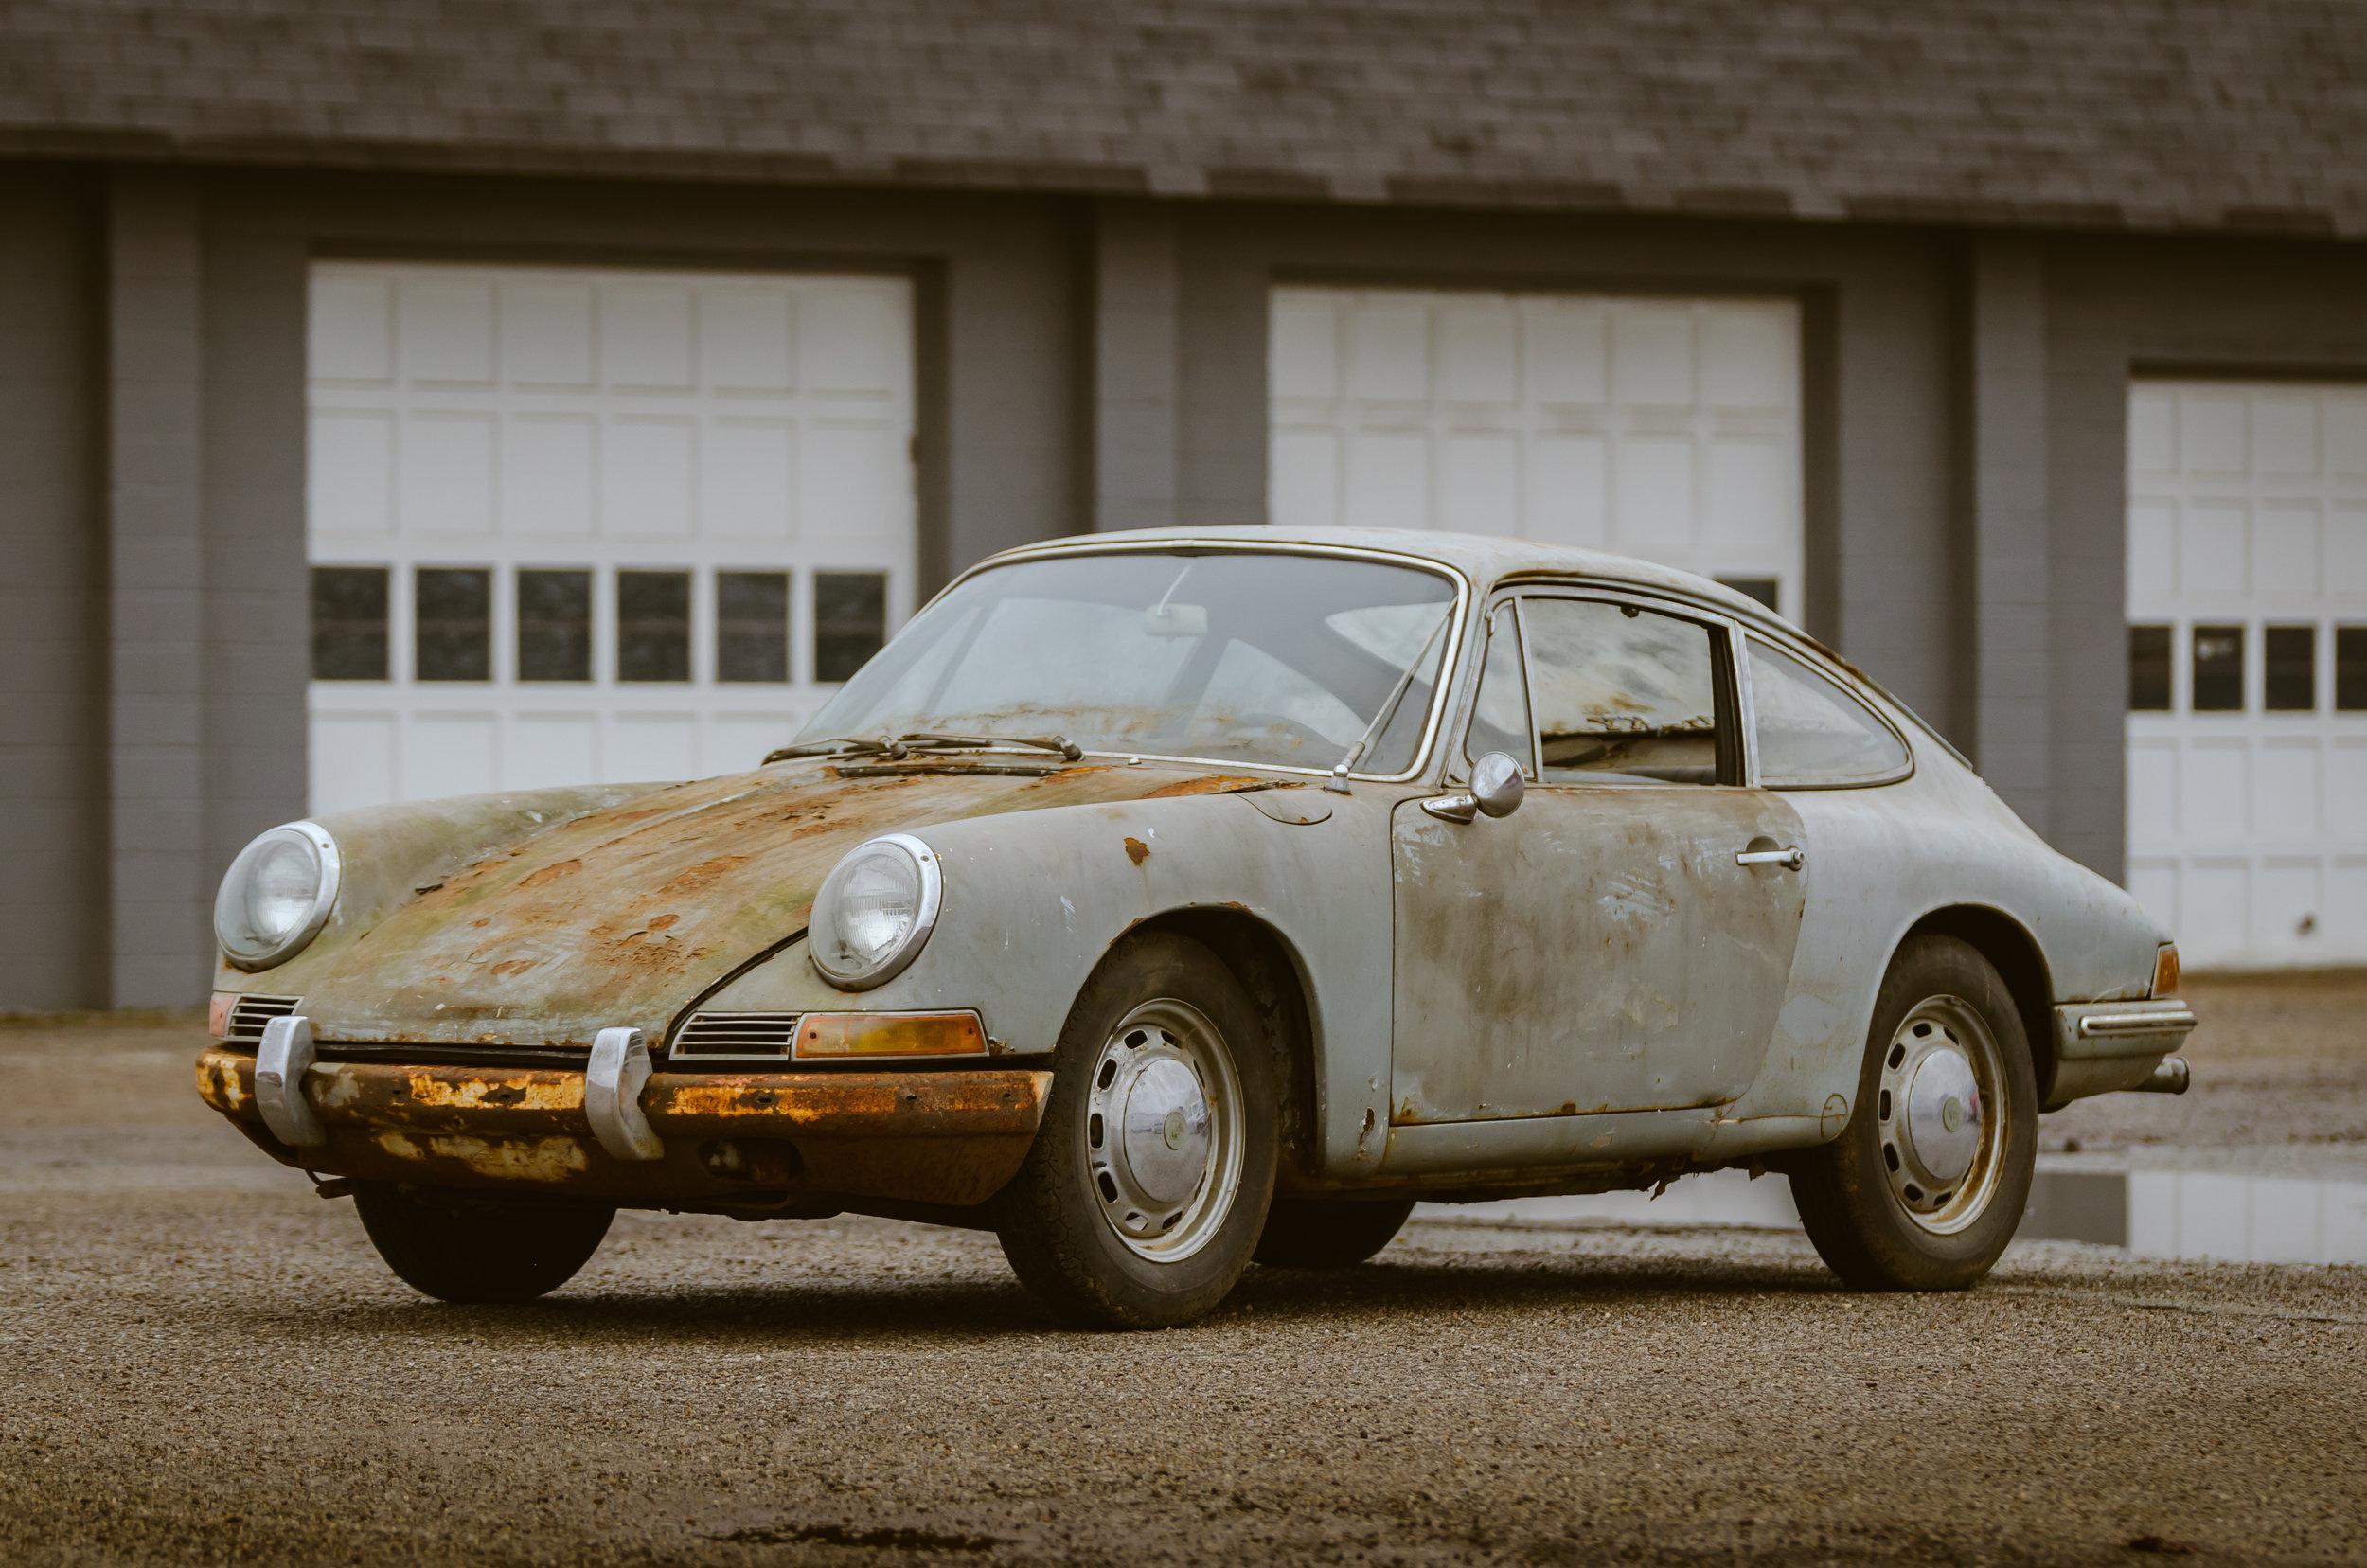 The Whole Car - Automotive Photoshoots